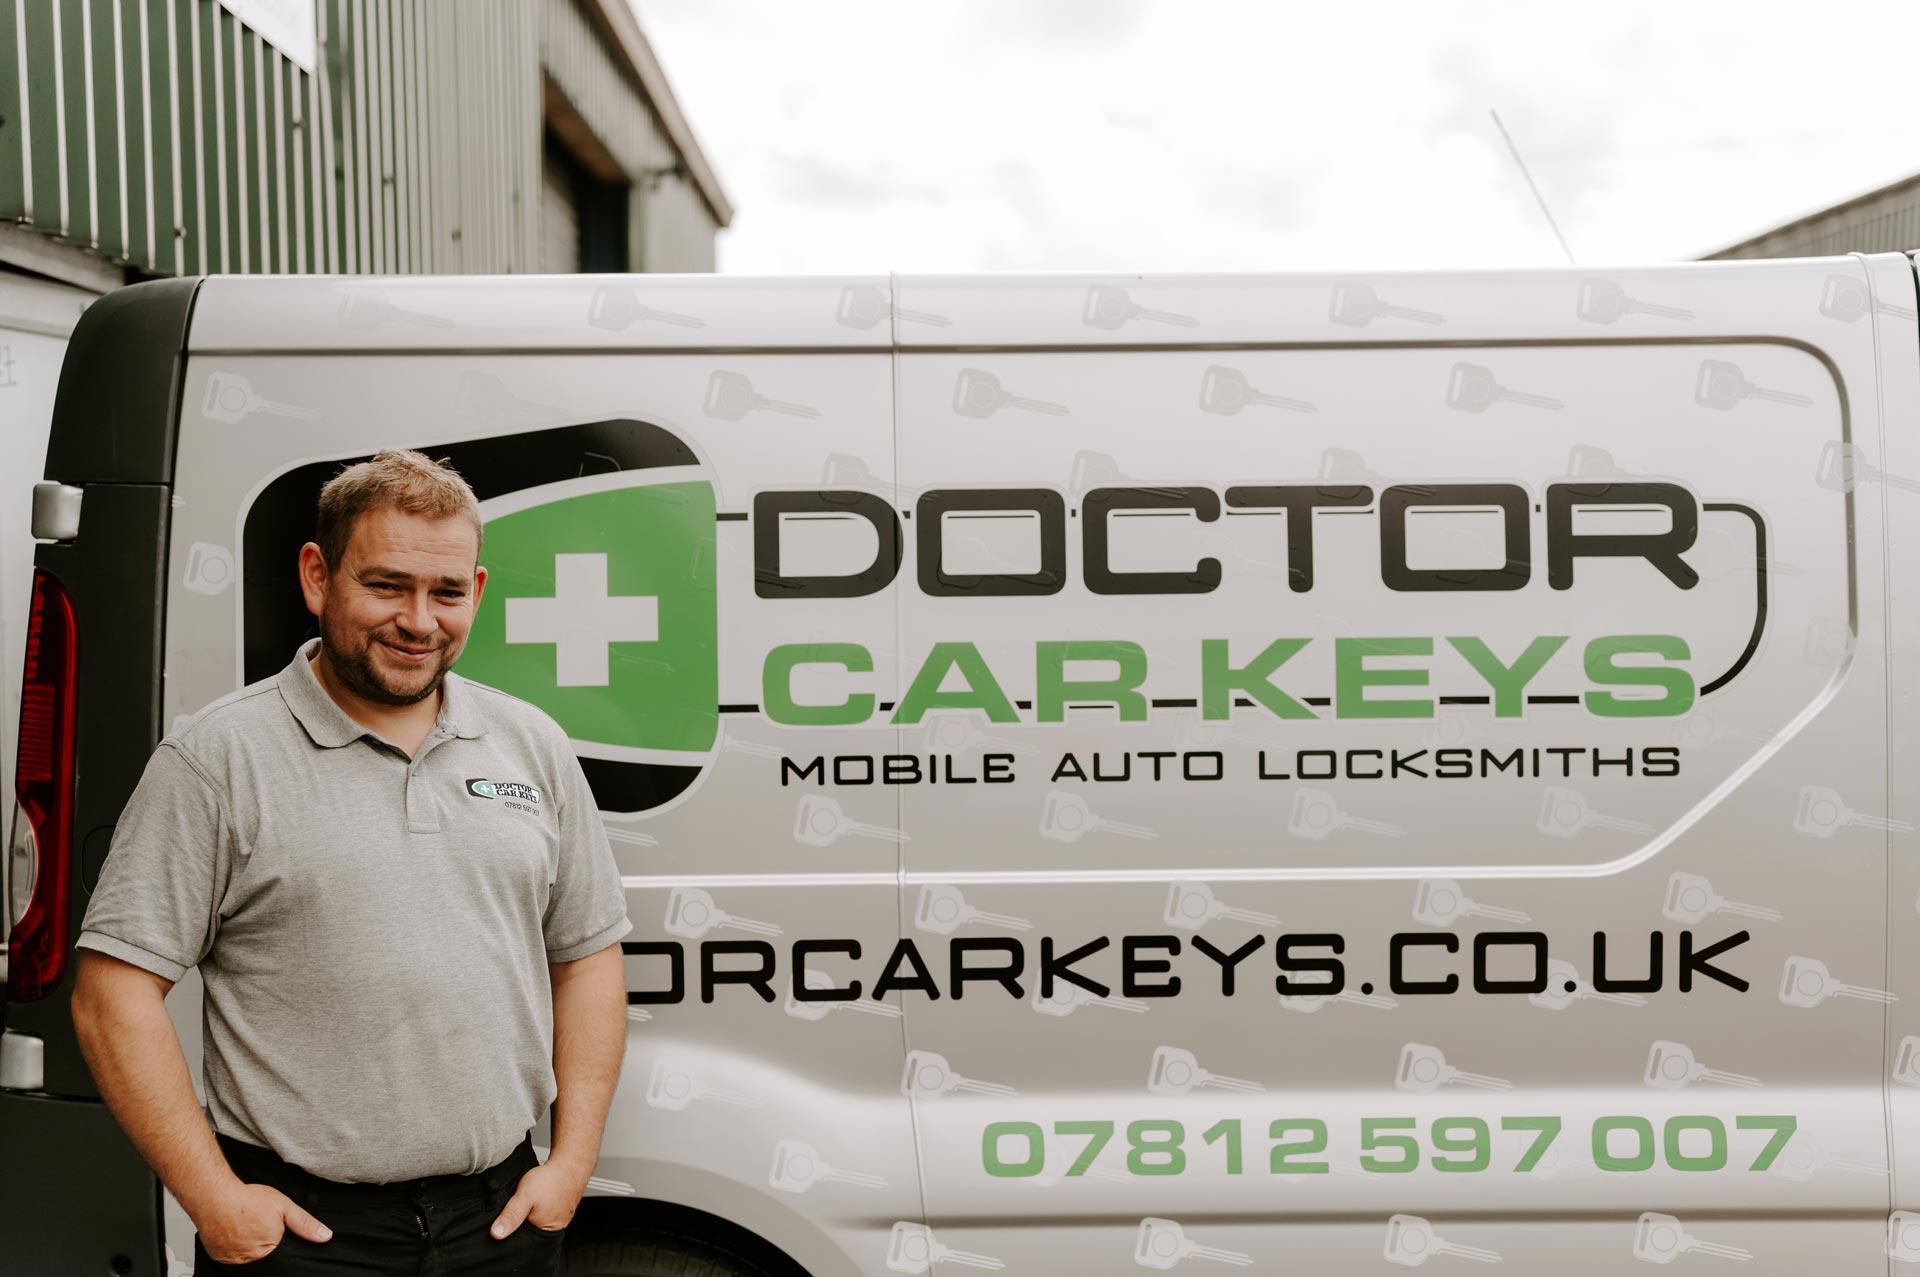 Auto Locksmiths in High Wycombe